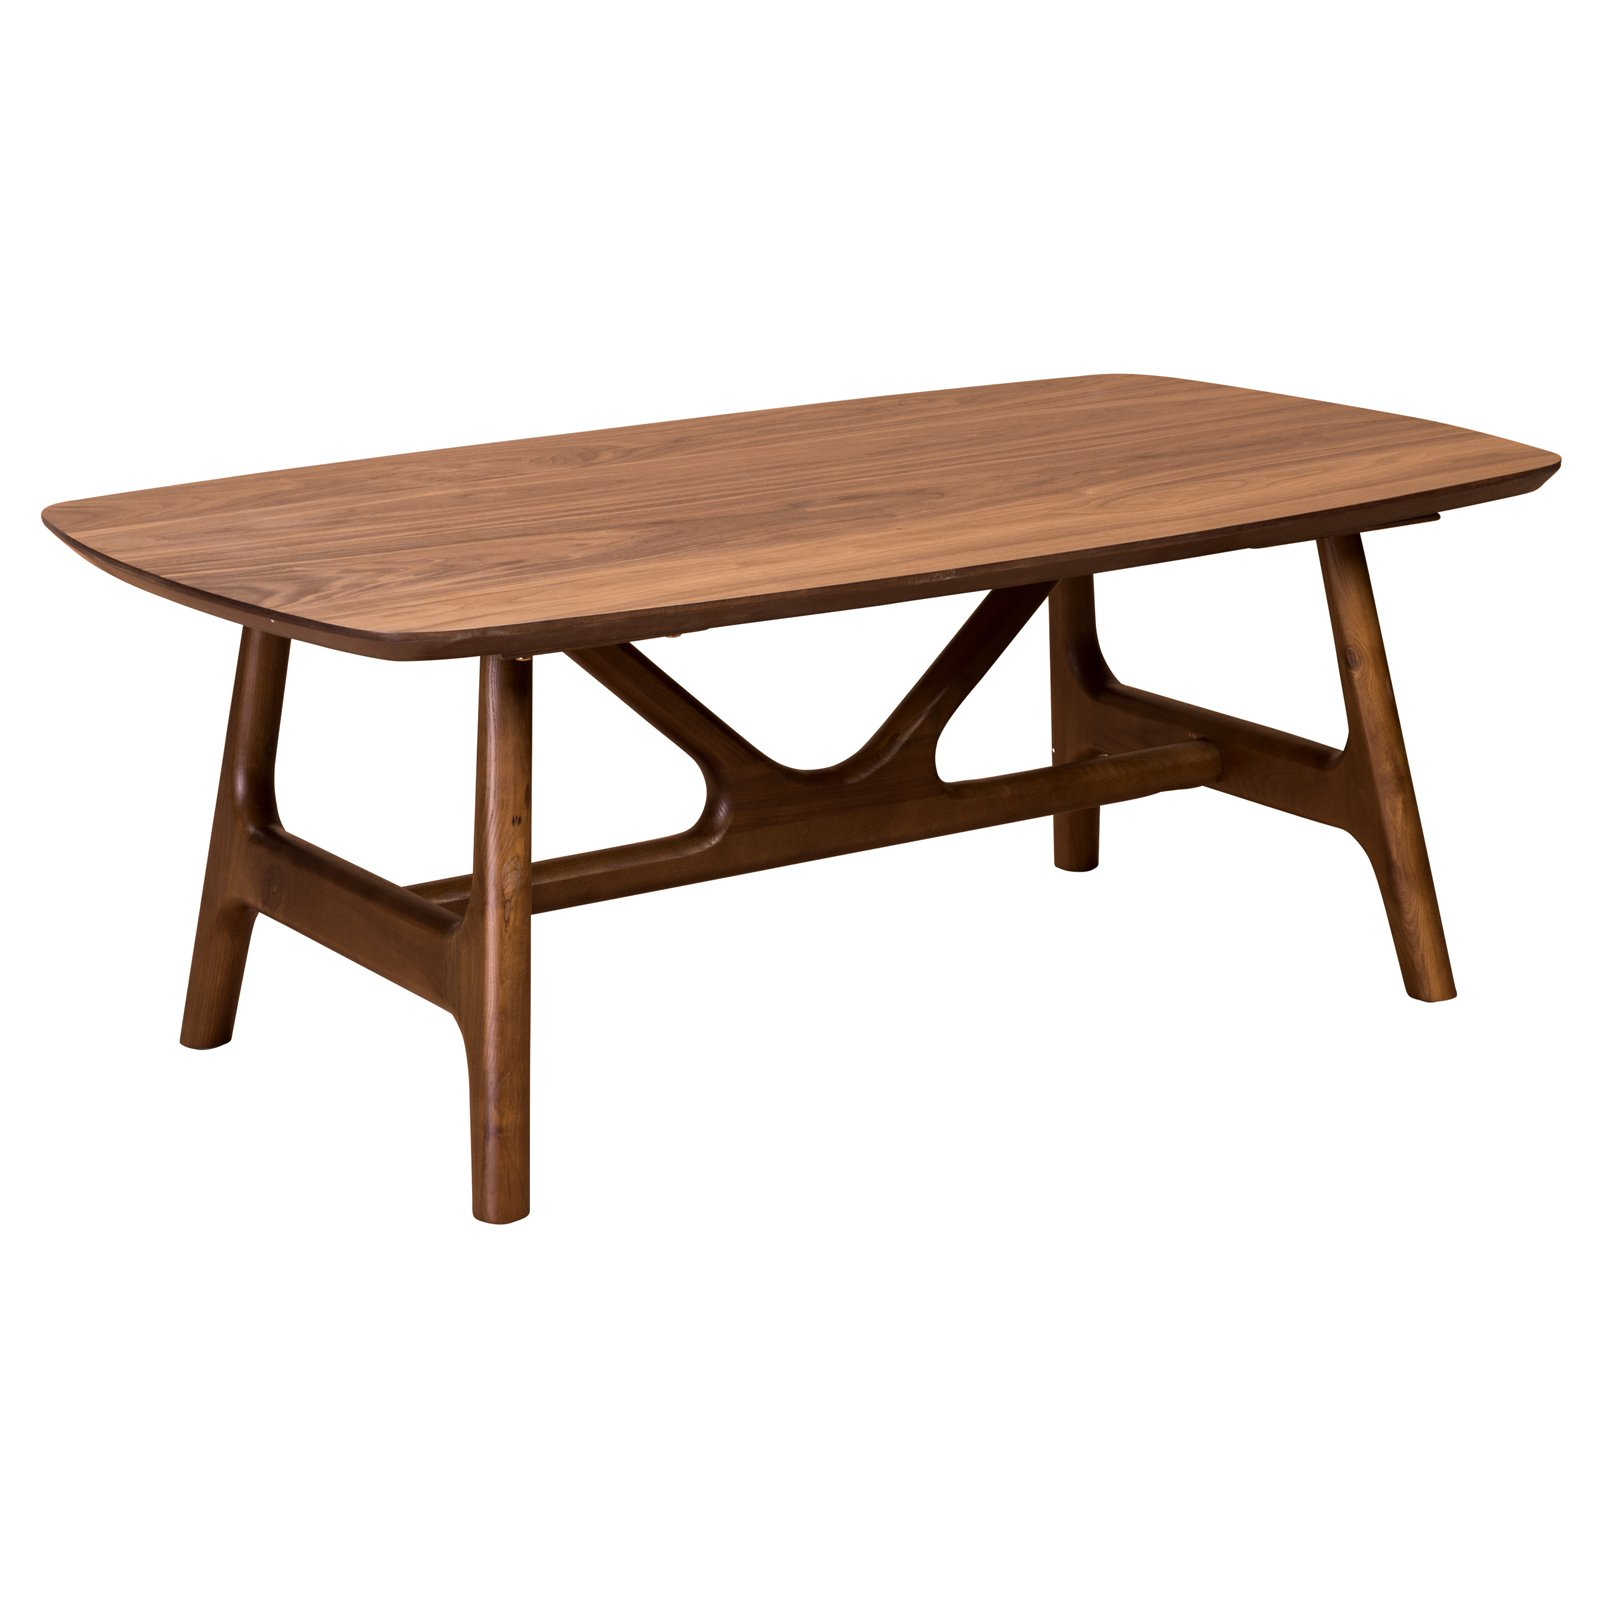 Euro Style Travis Mid Century Coffee Table Mid Century Coffee Table Coffee Table Modern Coffee Tables [ 1600 x 1600 Pixel ]